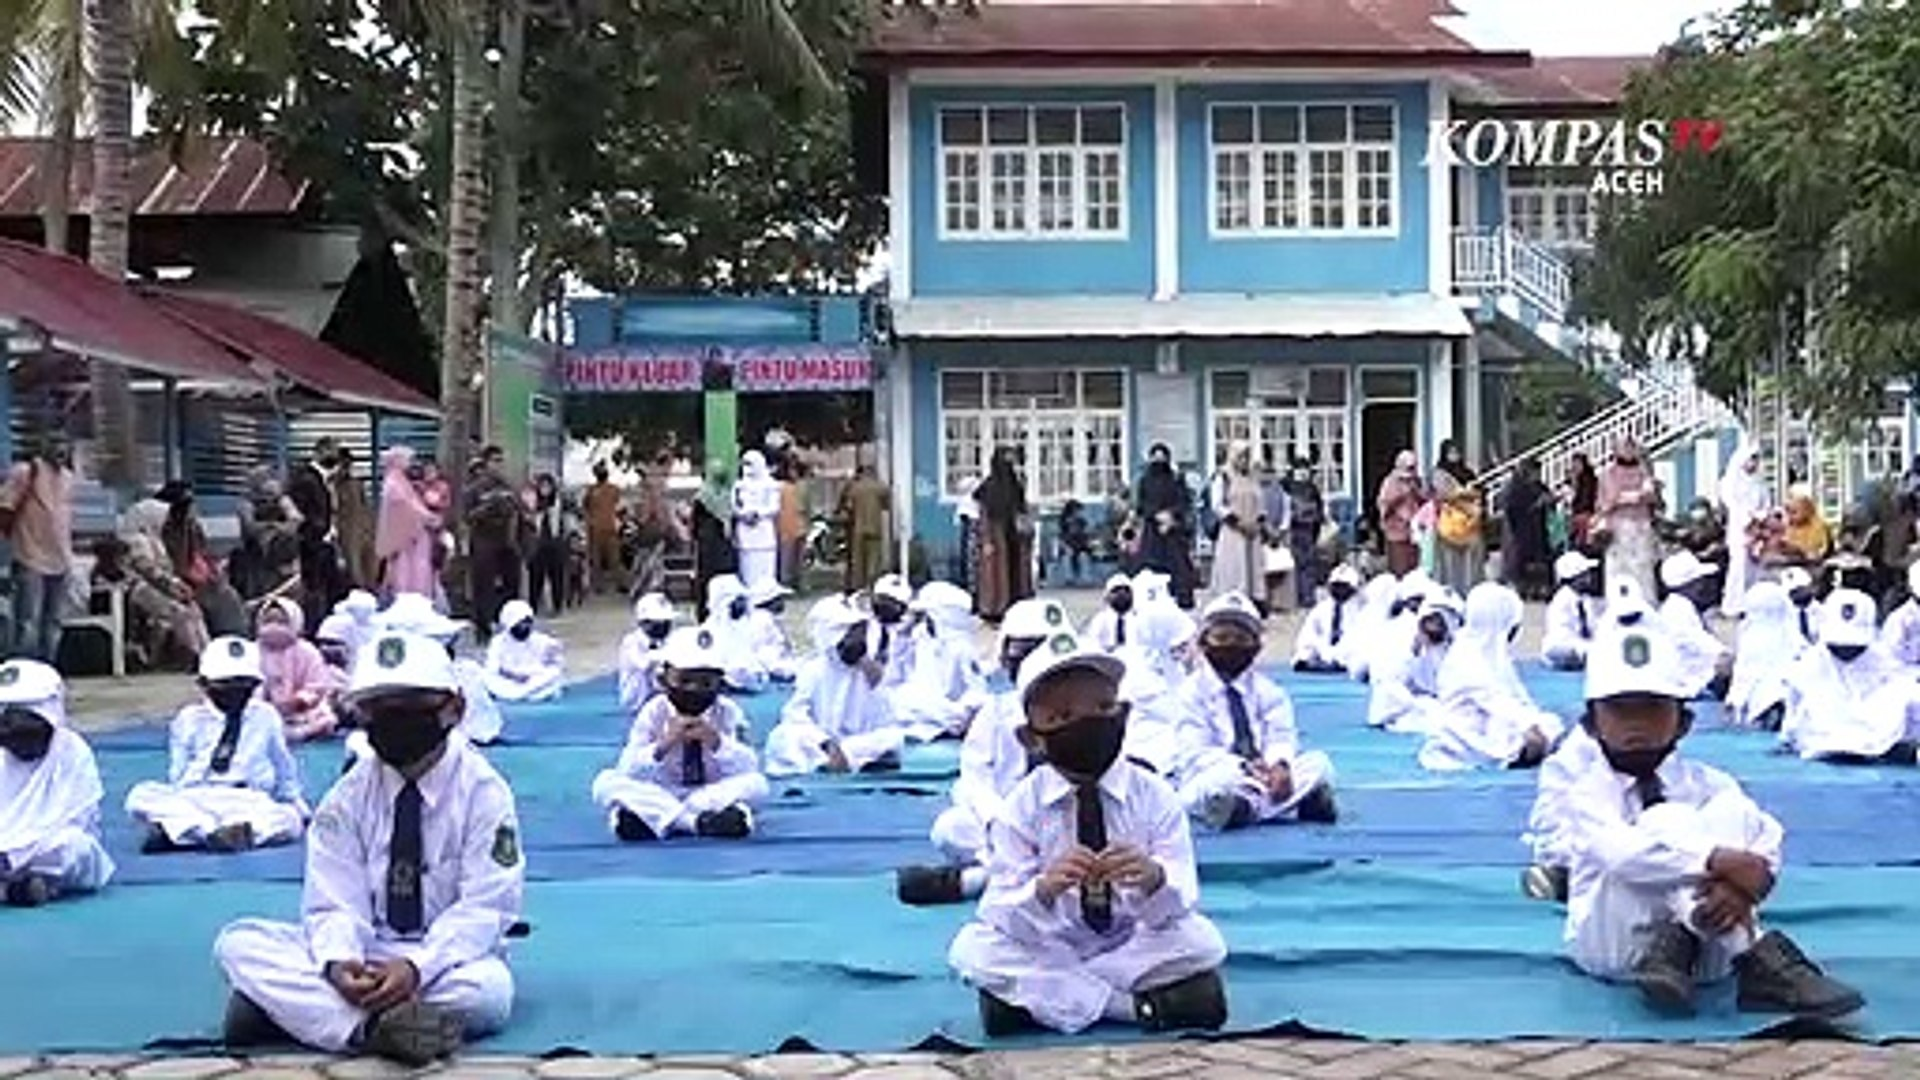 Min 9 Banda Aceh Gelar Pertemuan Tatap Muka Video Dailymotion